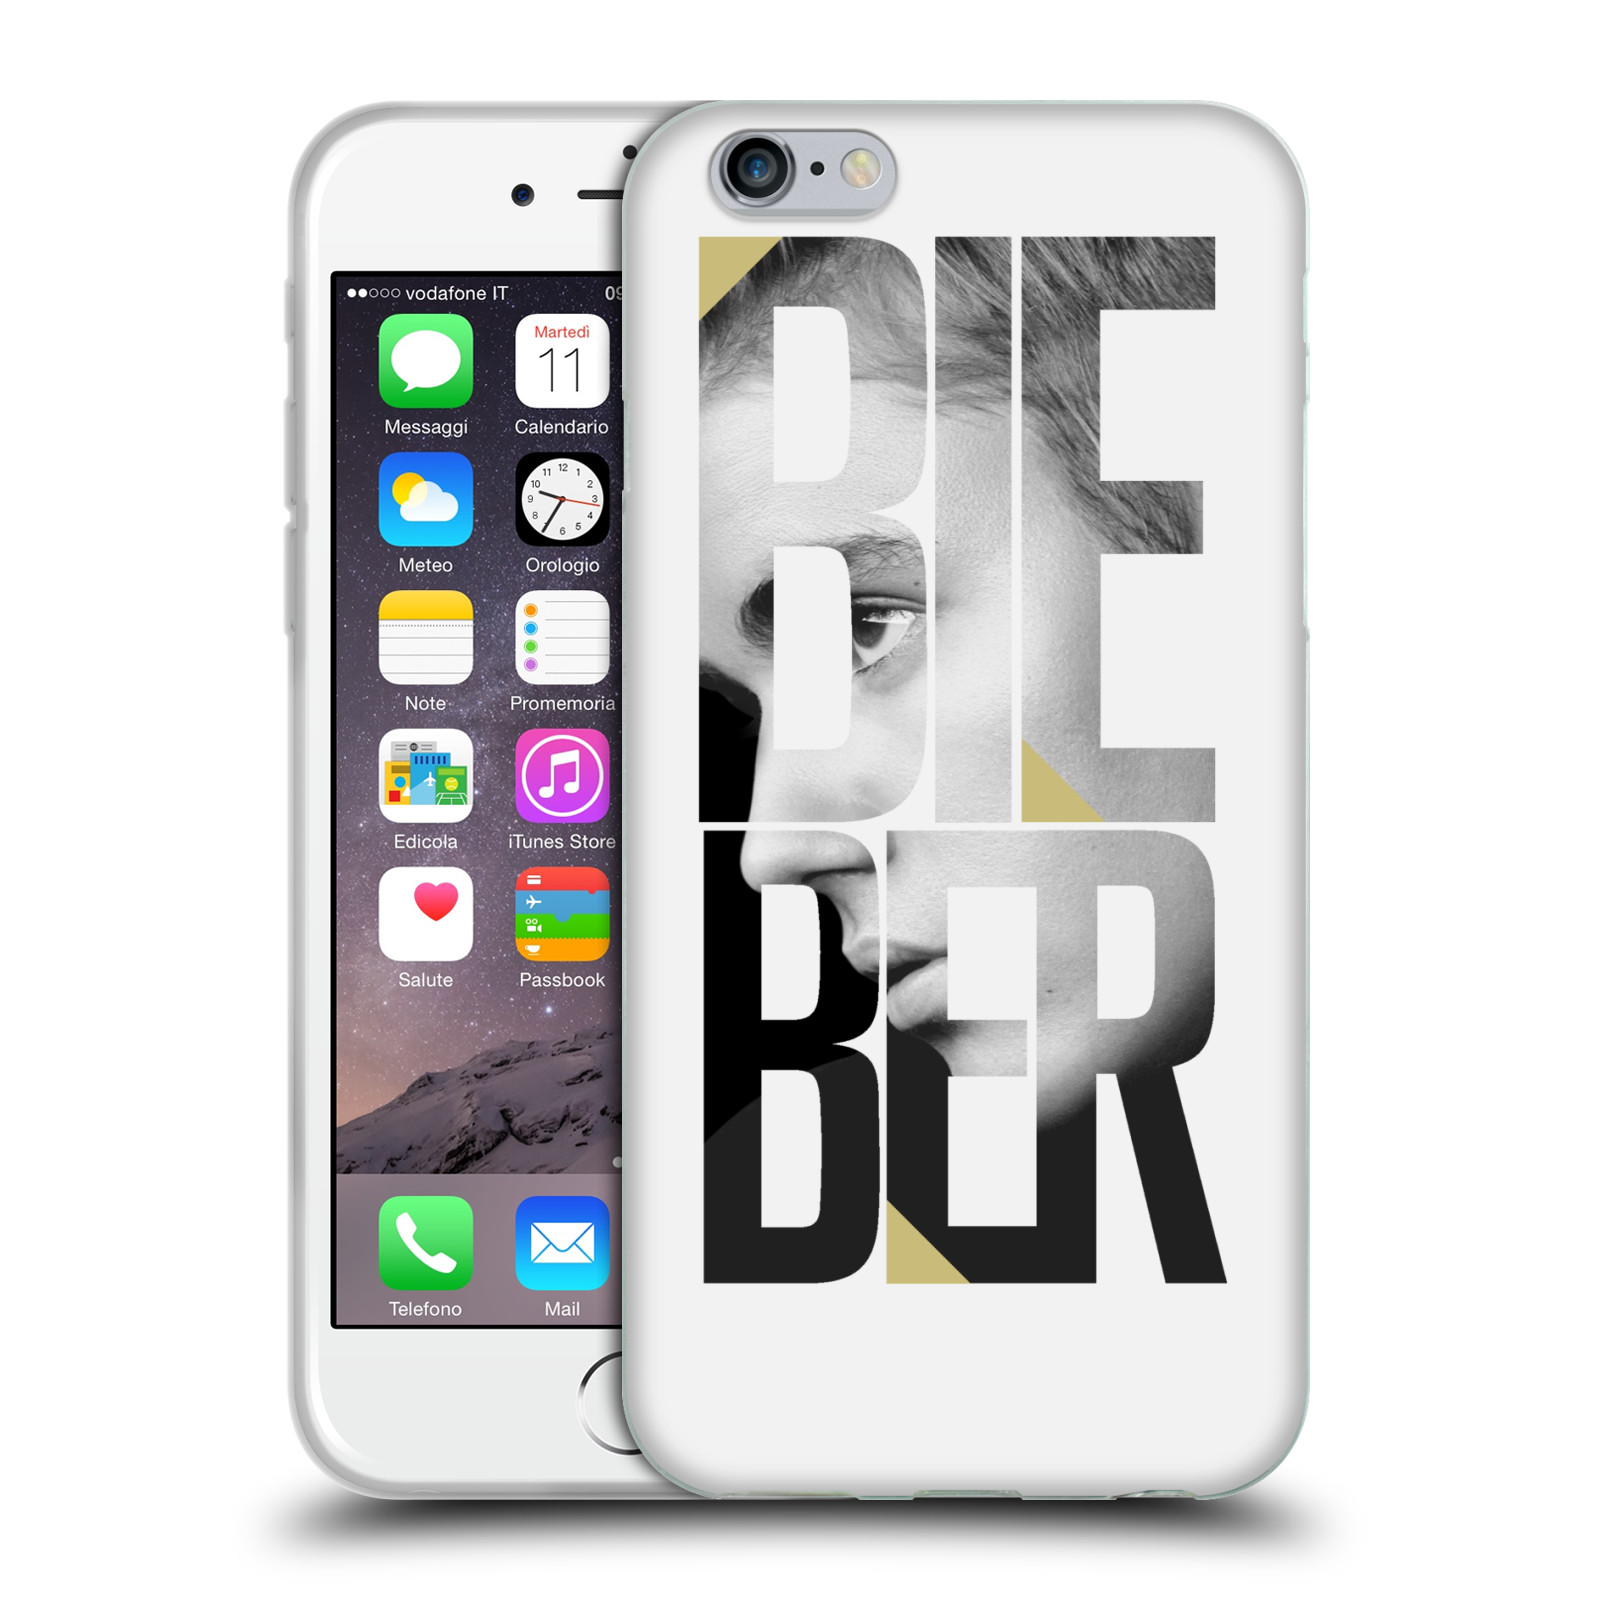 HEAD CASE silikonový obal na mobil Apple Iphone 6 / 6S originální potisk Justin Bieber nadpis fotka